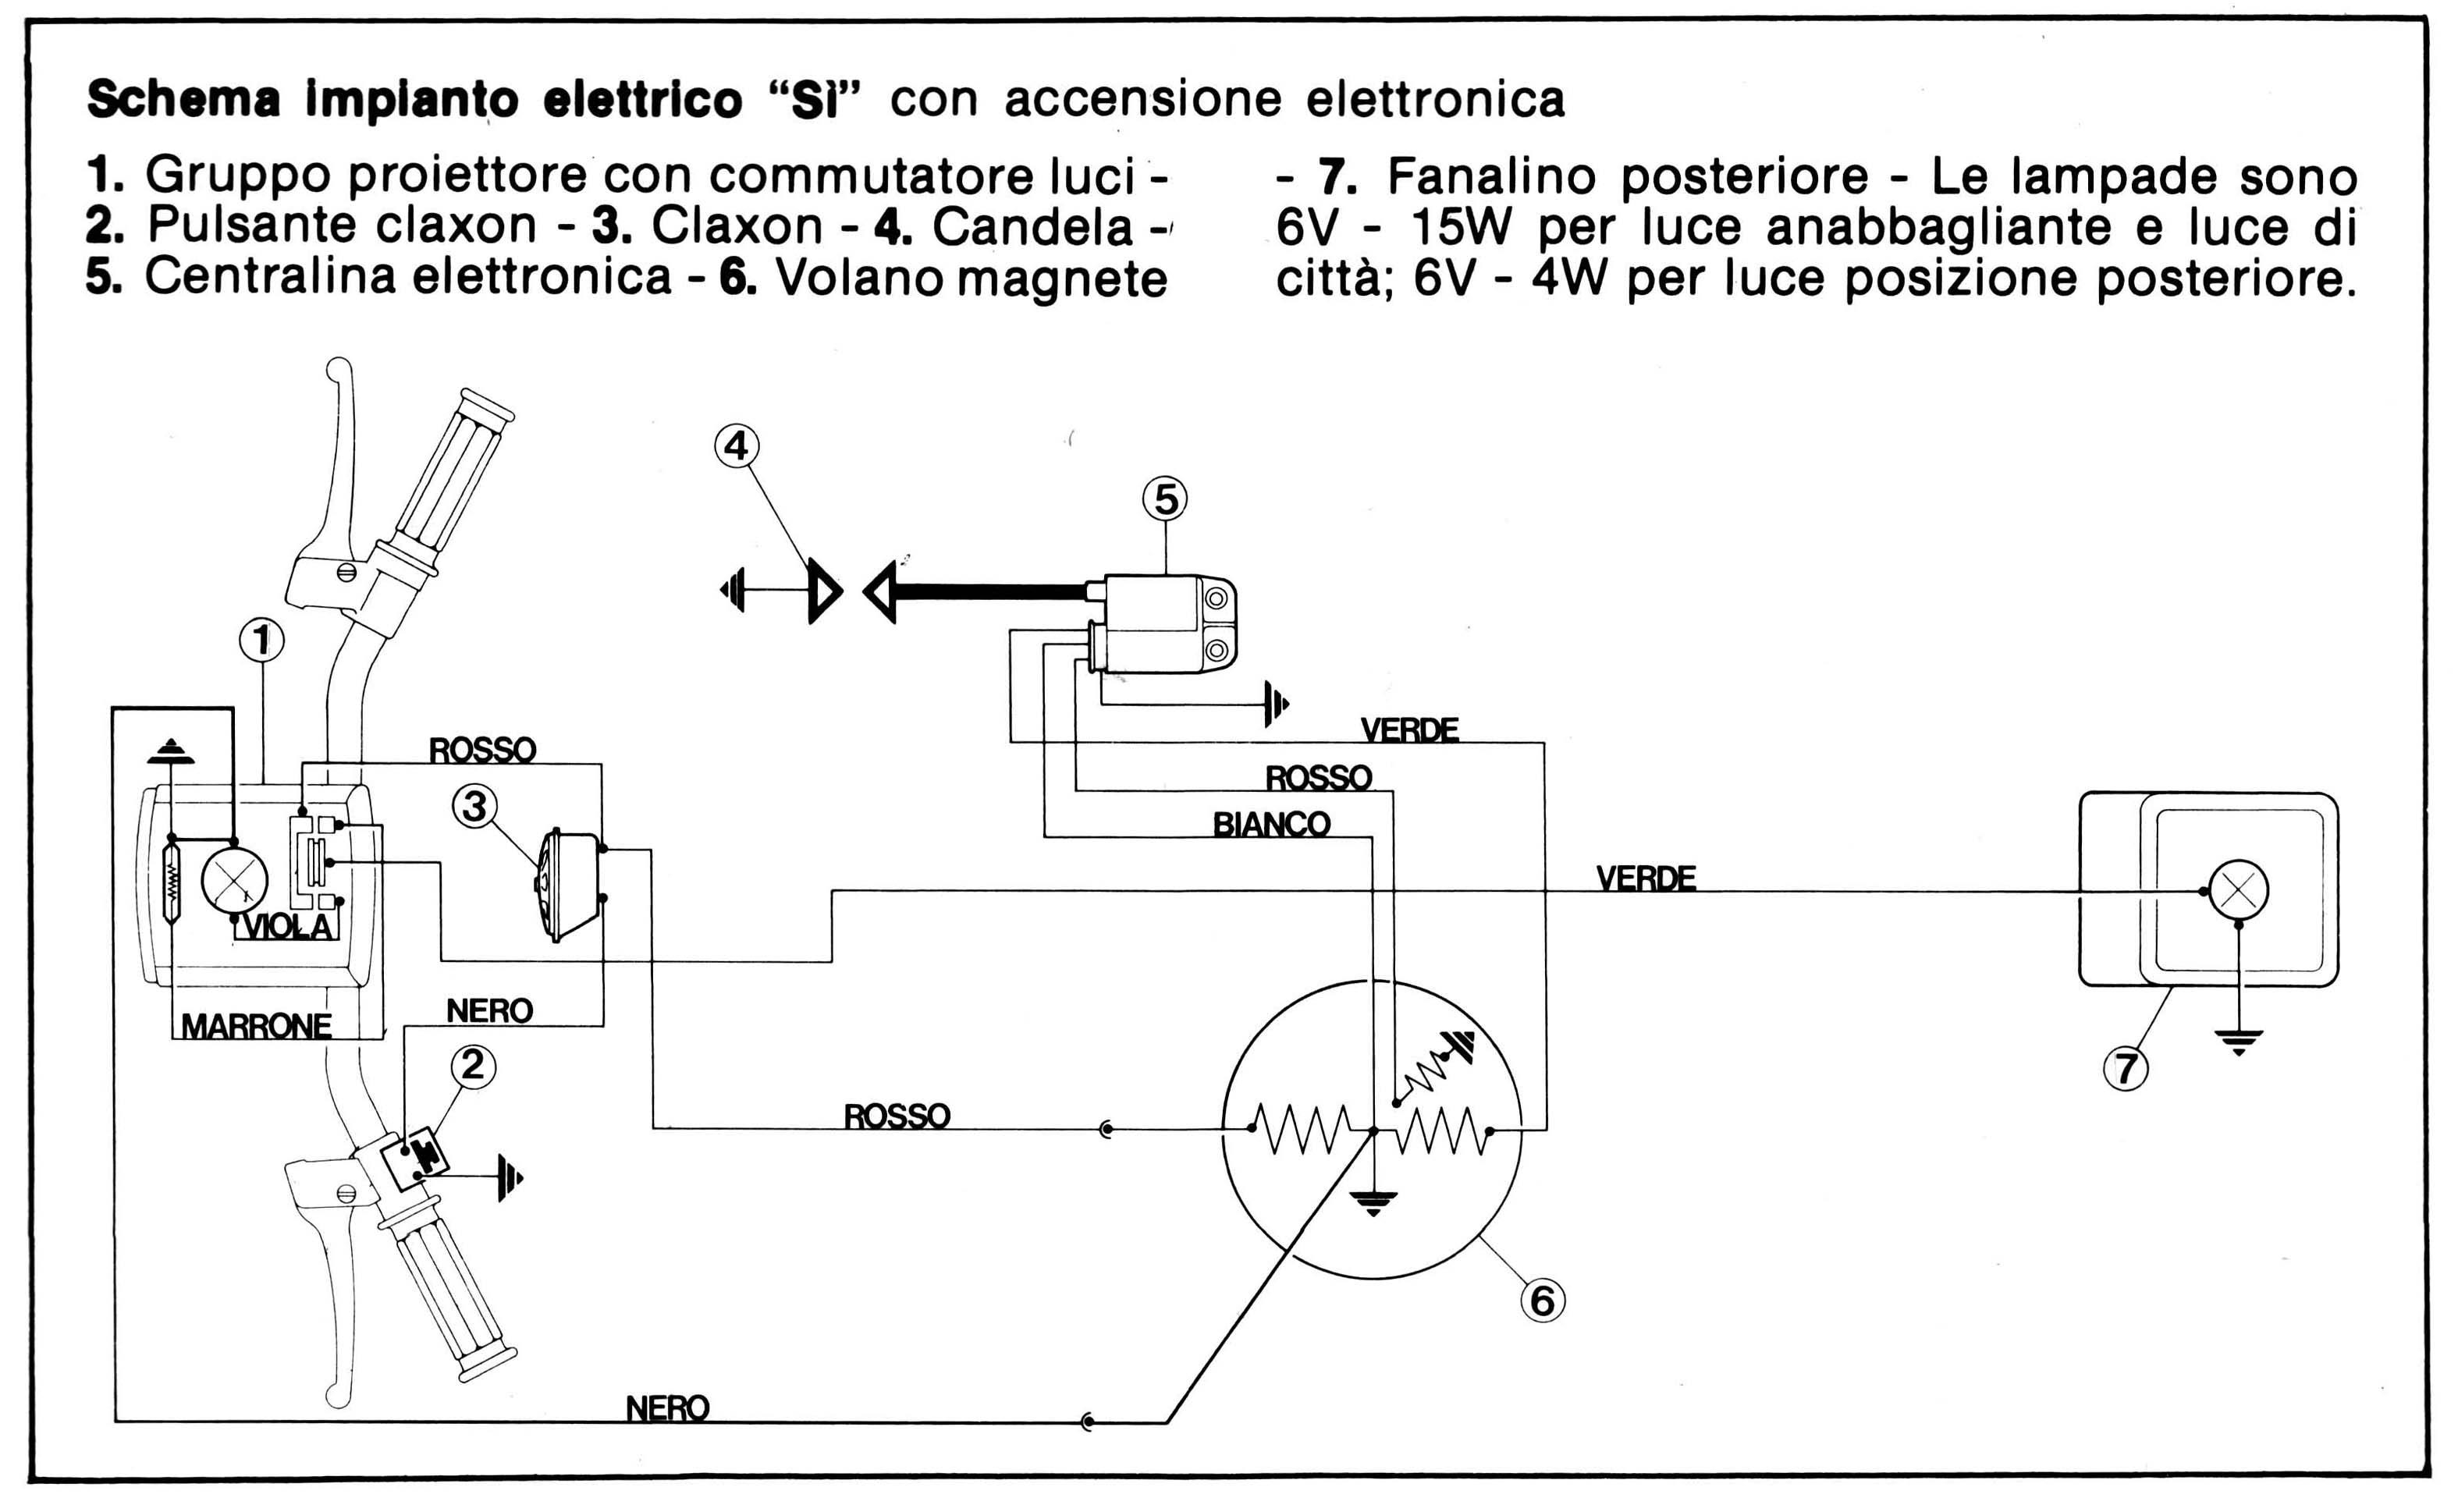 Schemi Elettrici Di Circuiti : Regolatore di tensione lampadine vespa u2022 il forum di electroyou